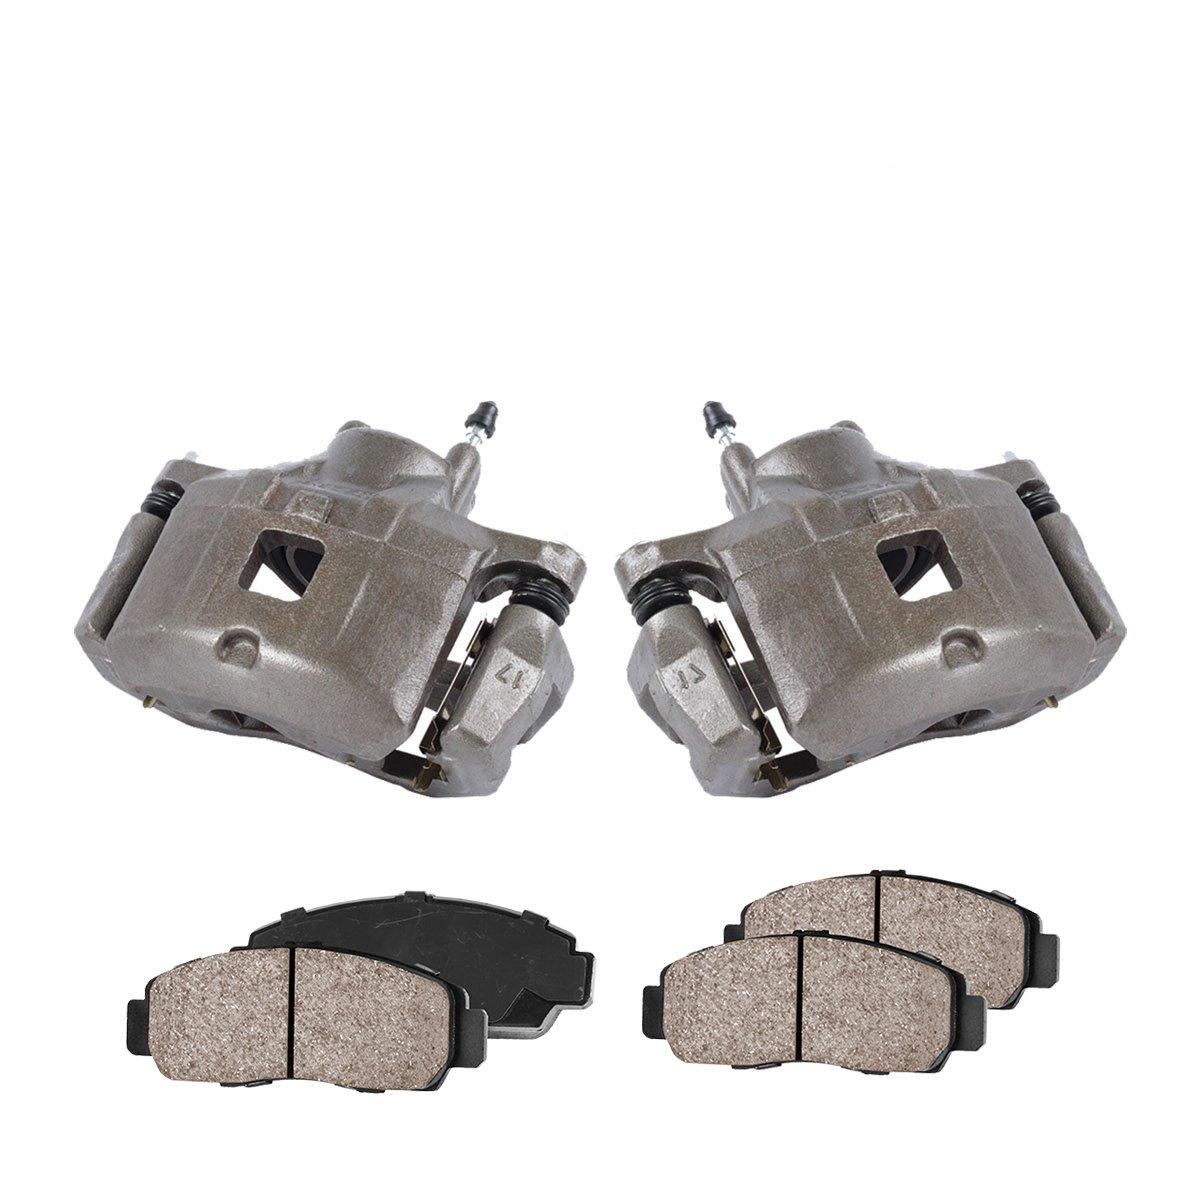 CCK01011 Quiet Low Dust Ceramic Brake Pads FRONT Premium Loaded OE Caliper Assembly Set 2